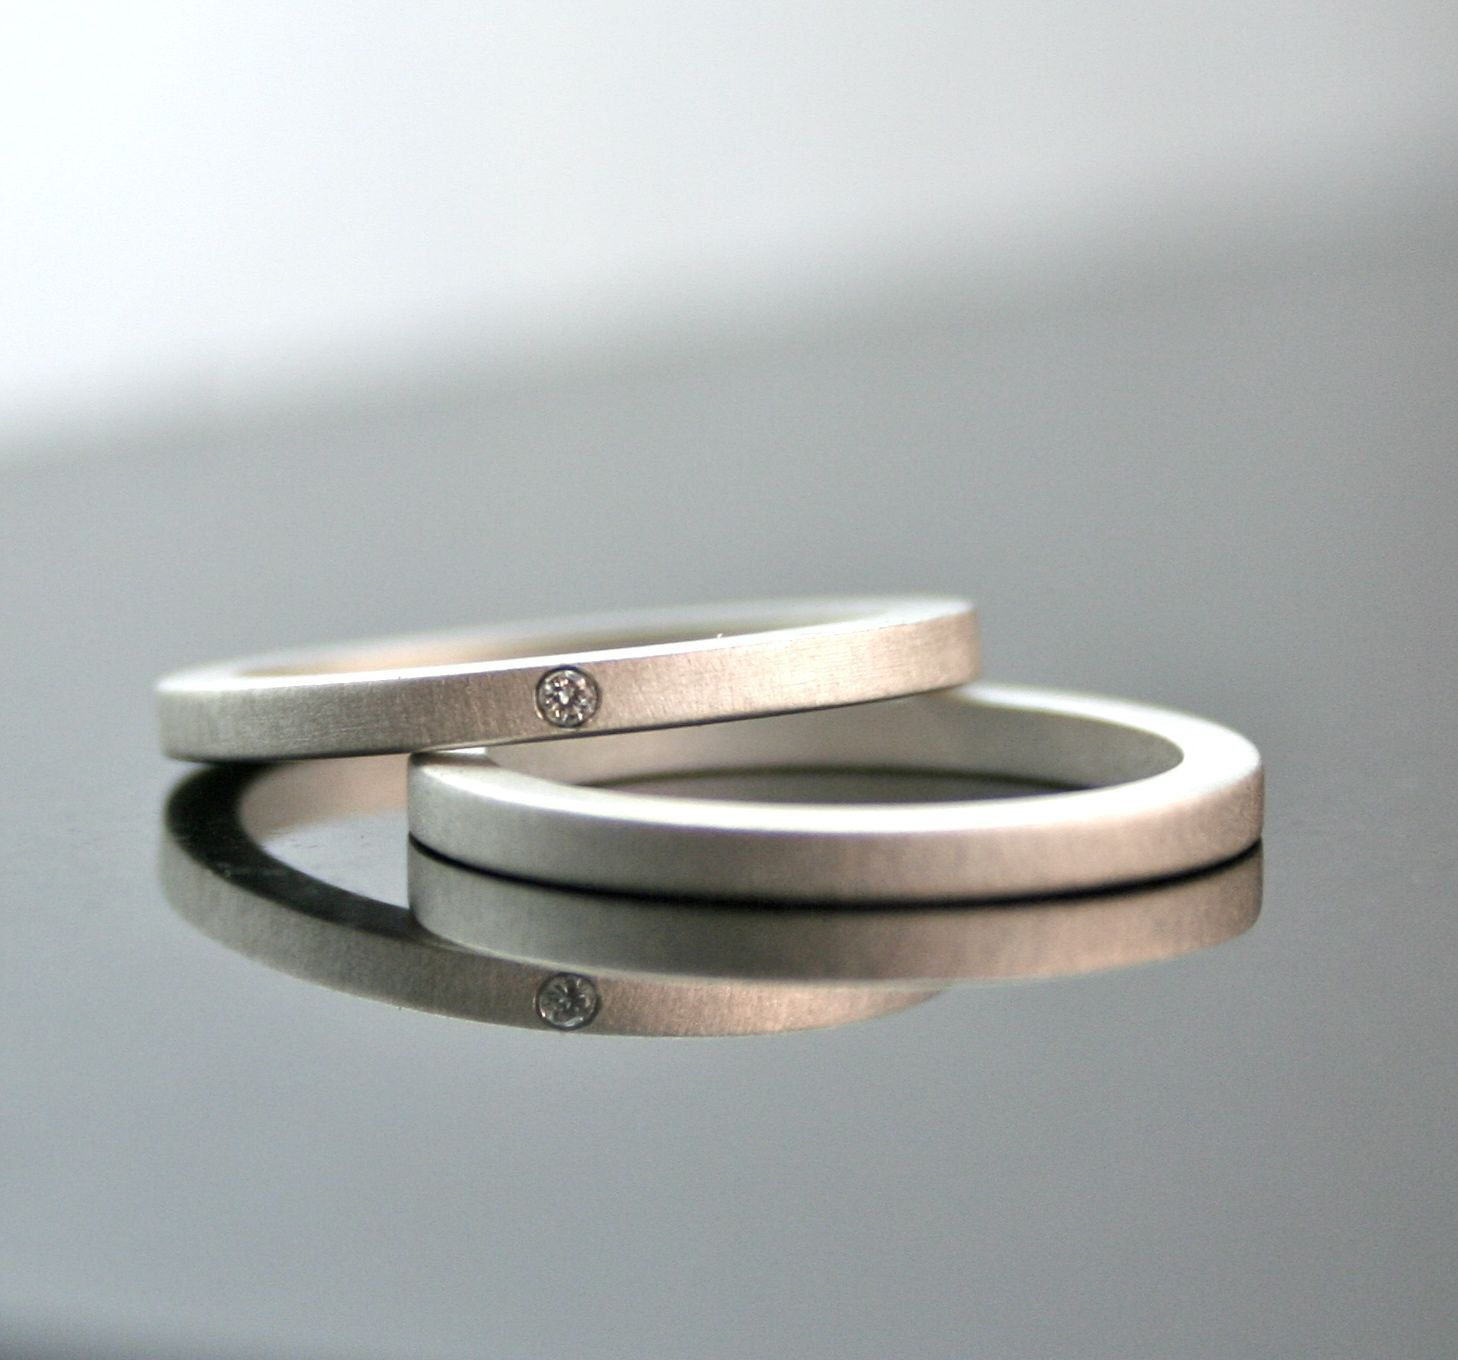 handmade wedding rings One Tiny Diamond Ring Set Simple Wedding Rings Sterling Silver Engagement Ring Set Matte Finish Simple Diamond Ring Modern 2 mm